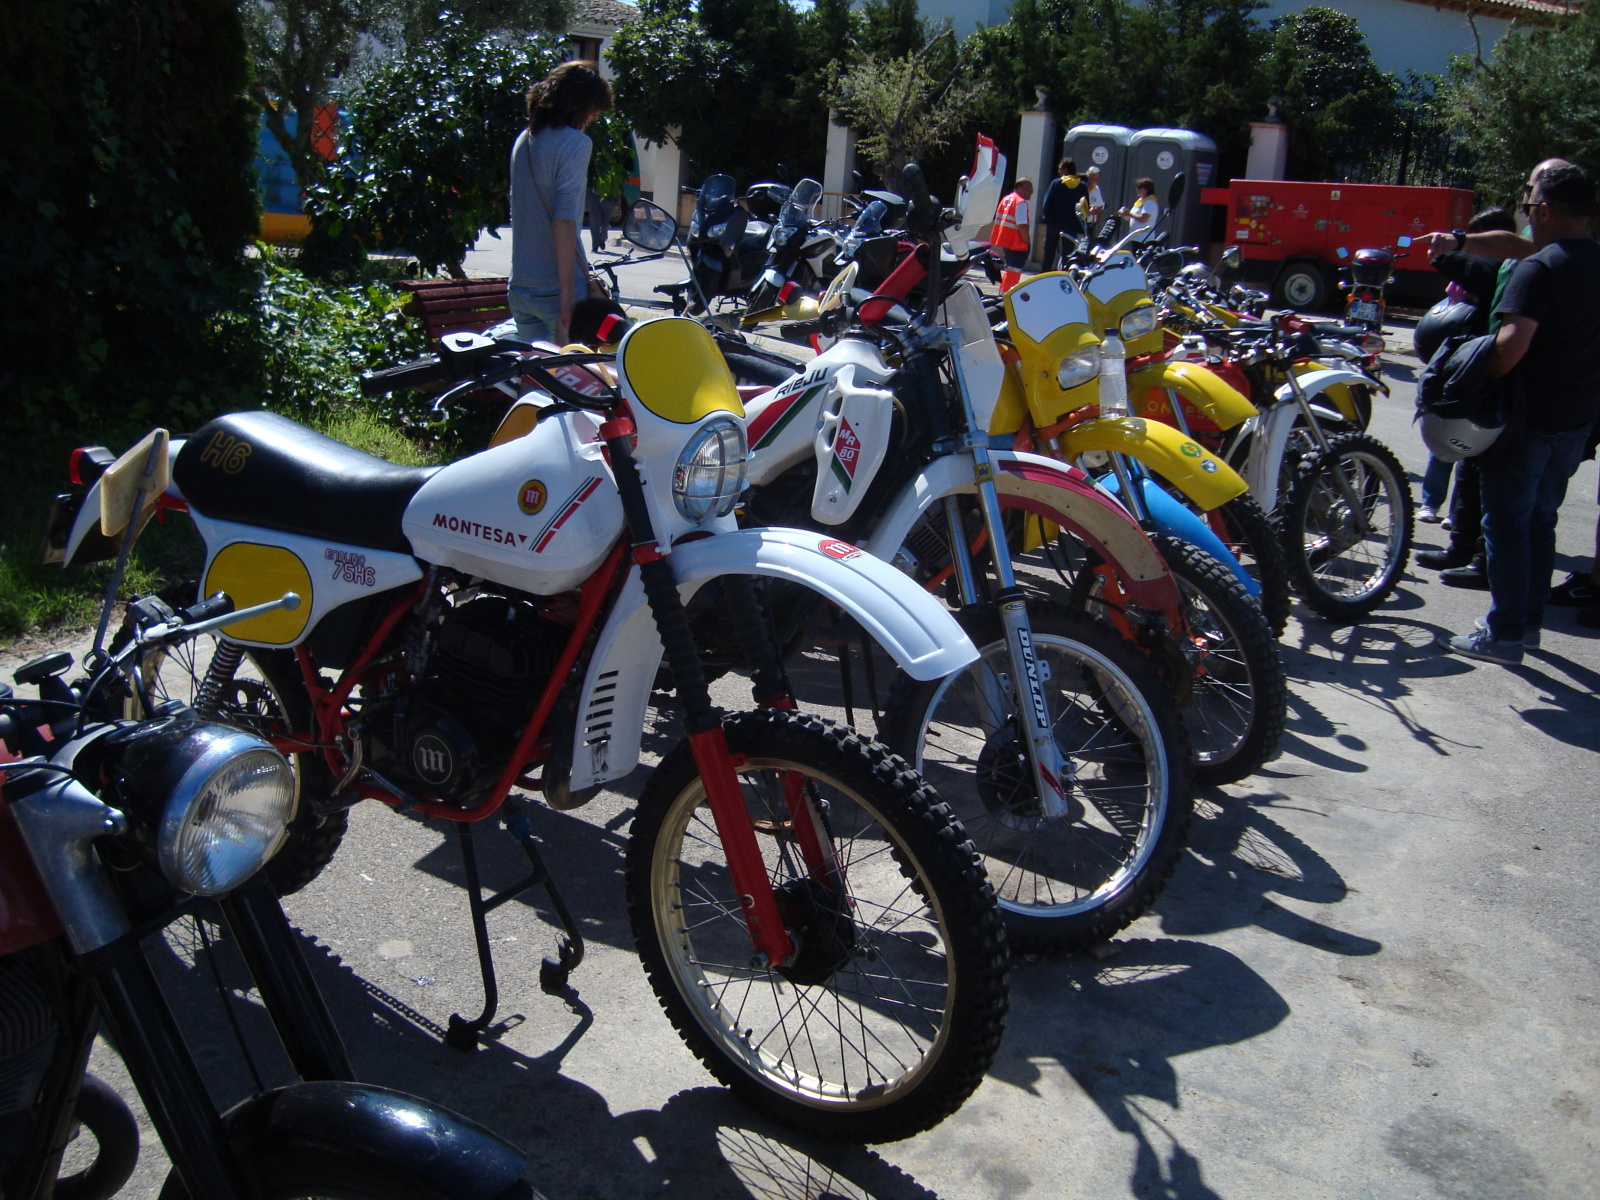 XI concentracion de motos antiguas en Alberuela de tubo (Huesca) 261iusk